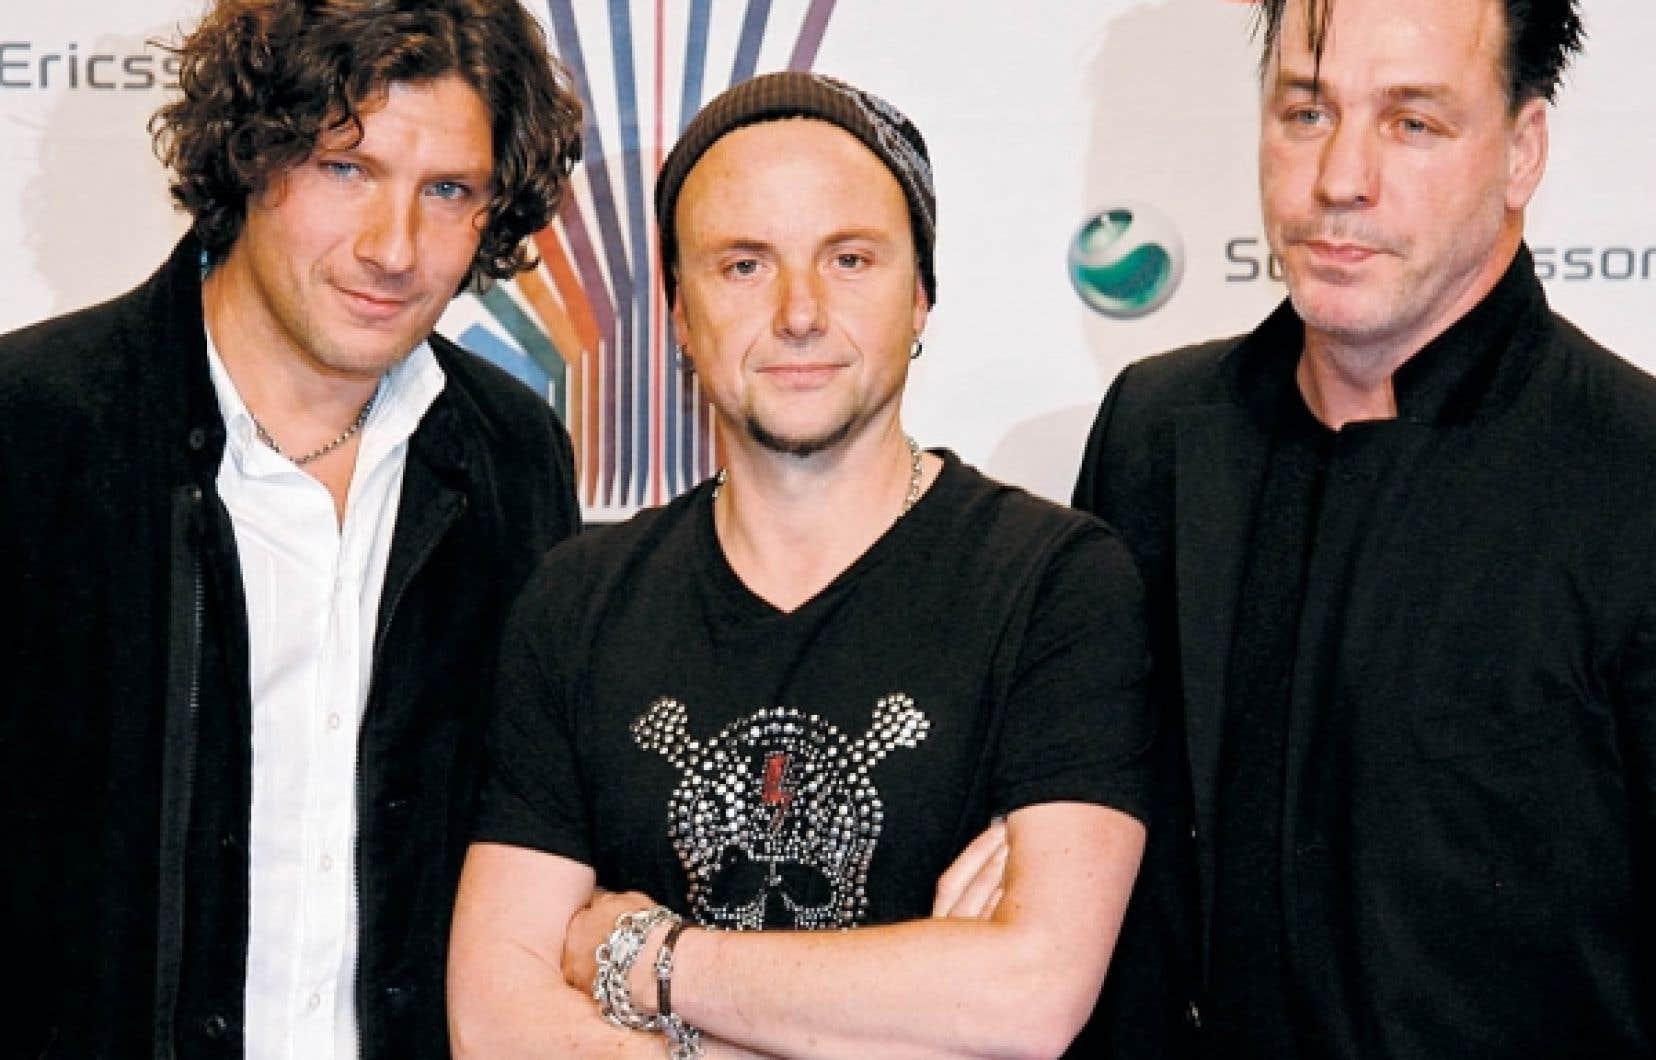 Christoph Schneider, Paul Landers et Till Lindemann, du groupe Rammstein, à leur arrivée au MTV Europe Music Awards, à Munich en novembre 2007.<br />